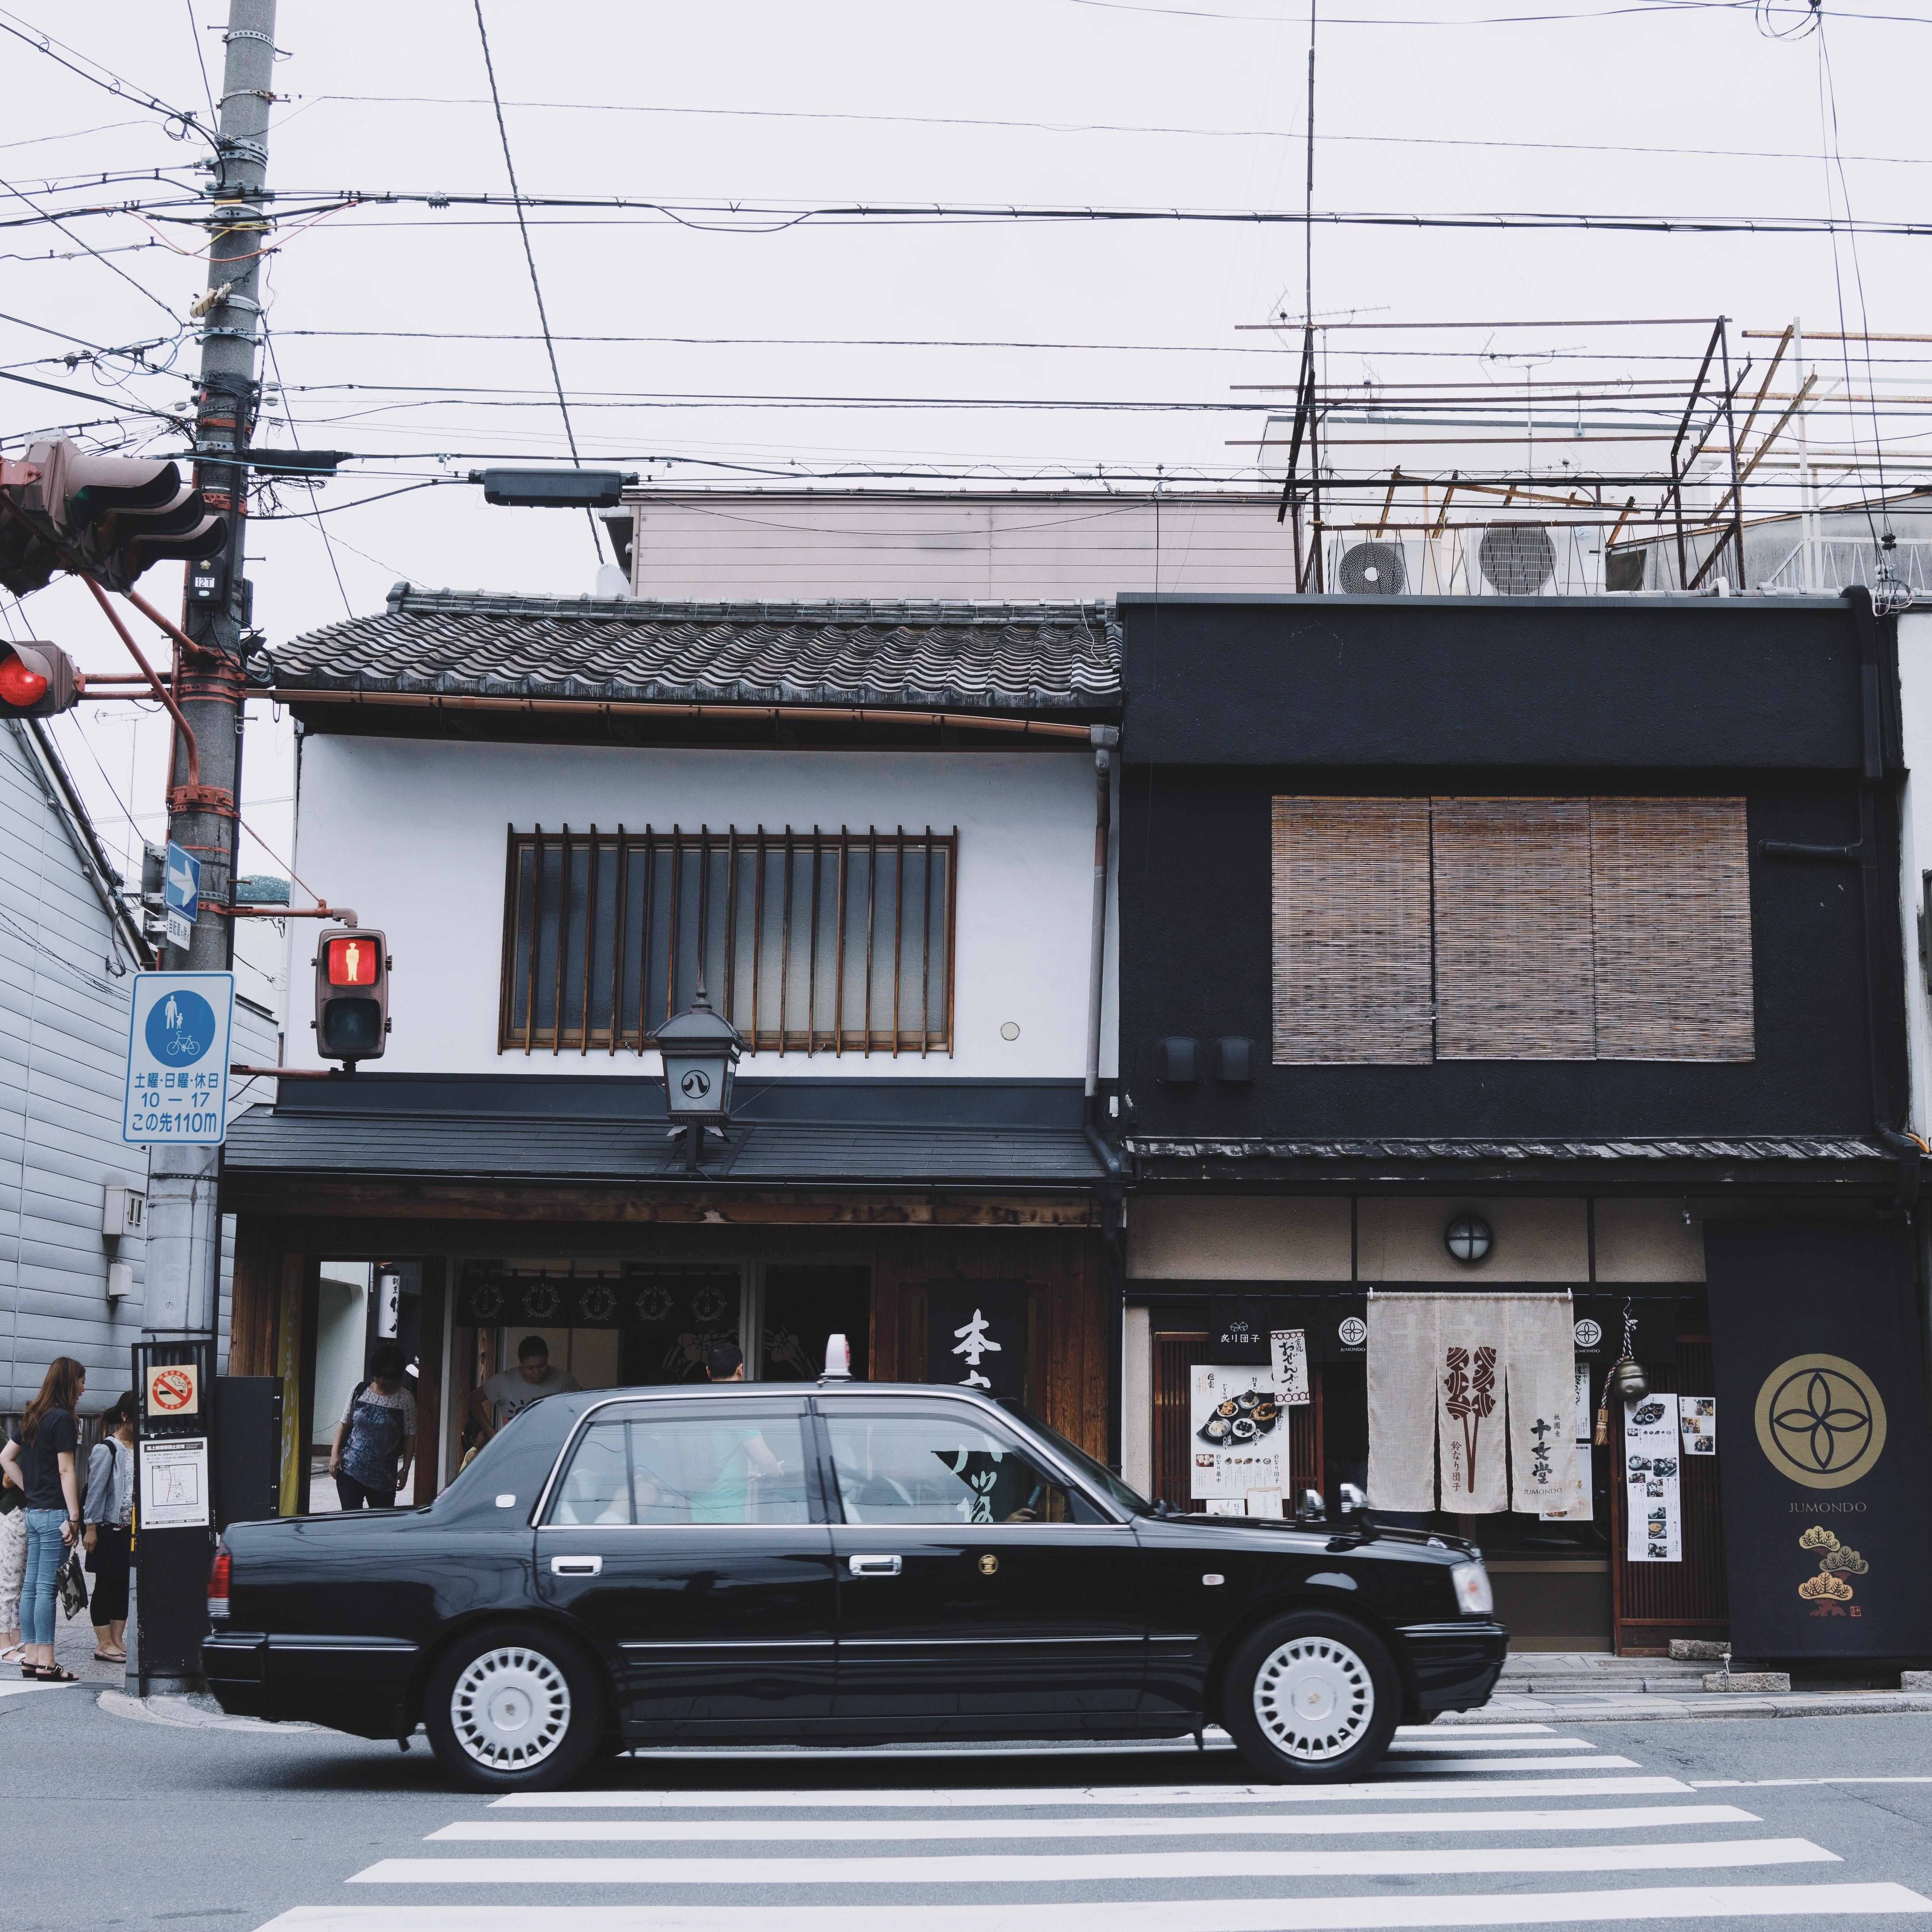 Old black car drives down an urban street by houses